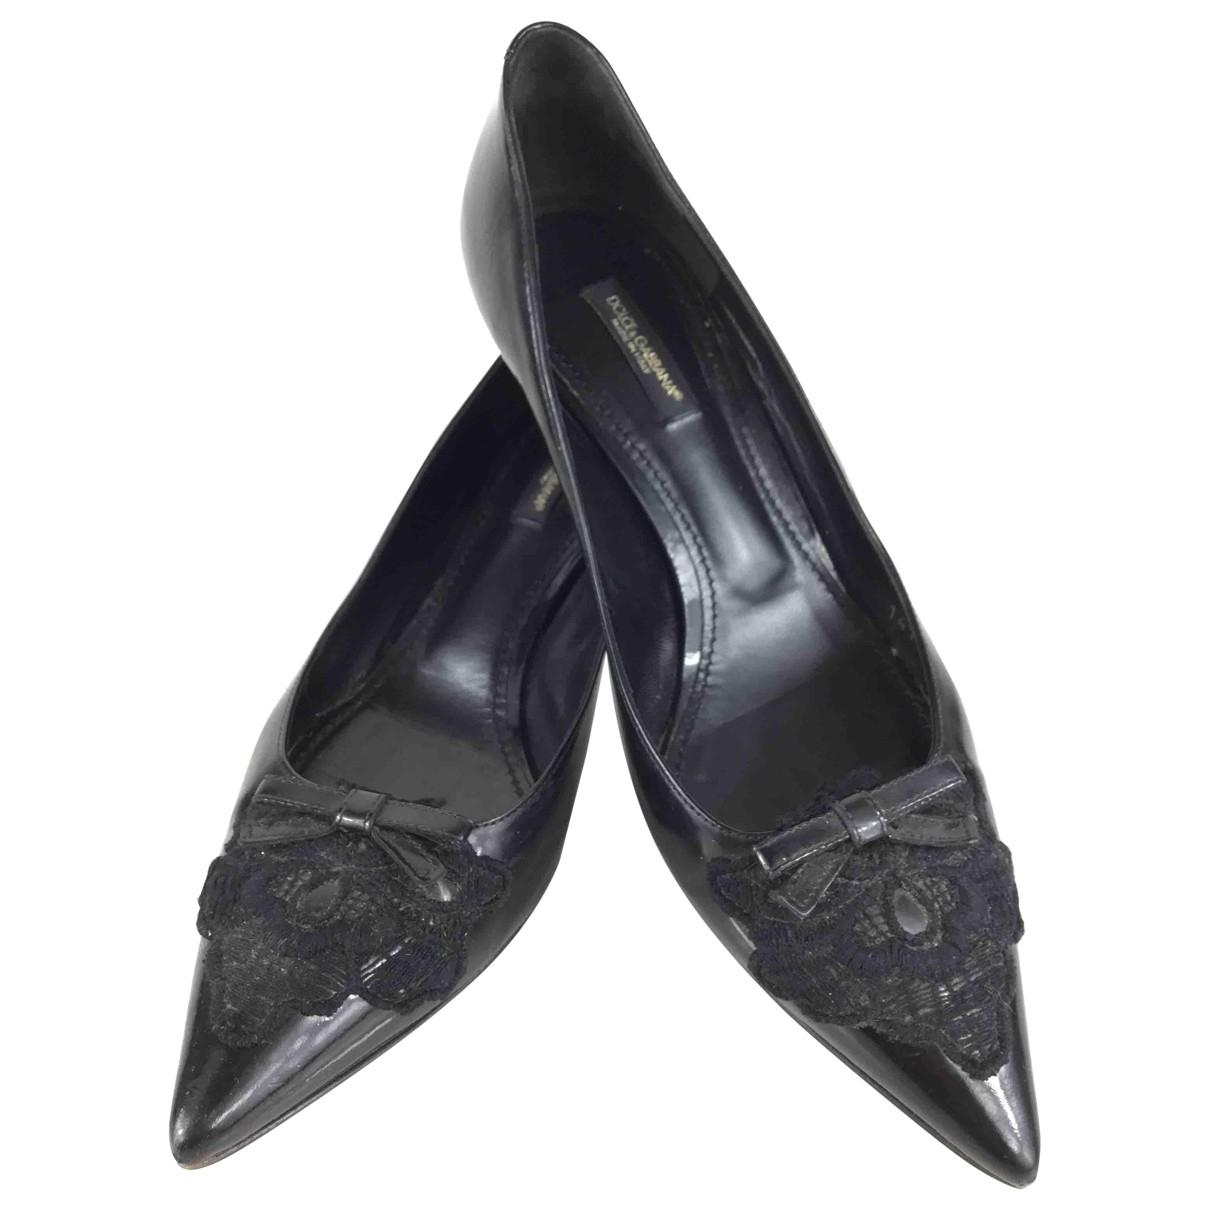 Dolce & Gabbana \N Pumps in  Schwarz Leder